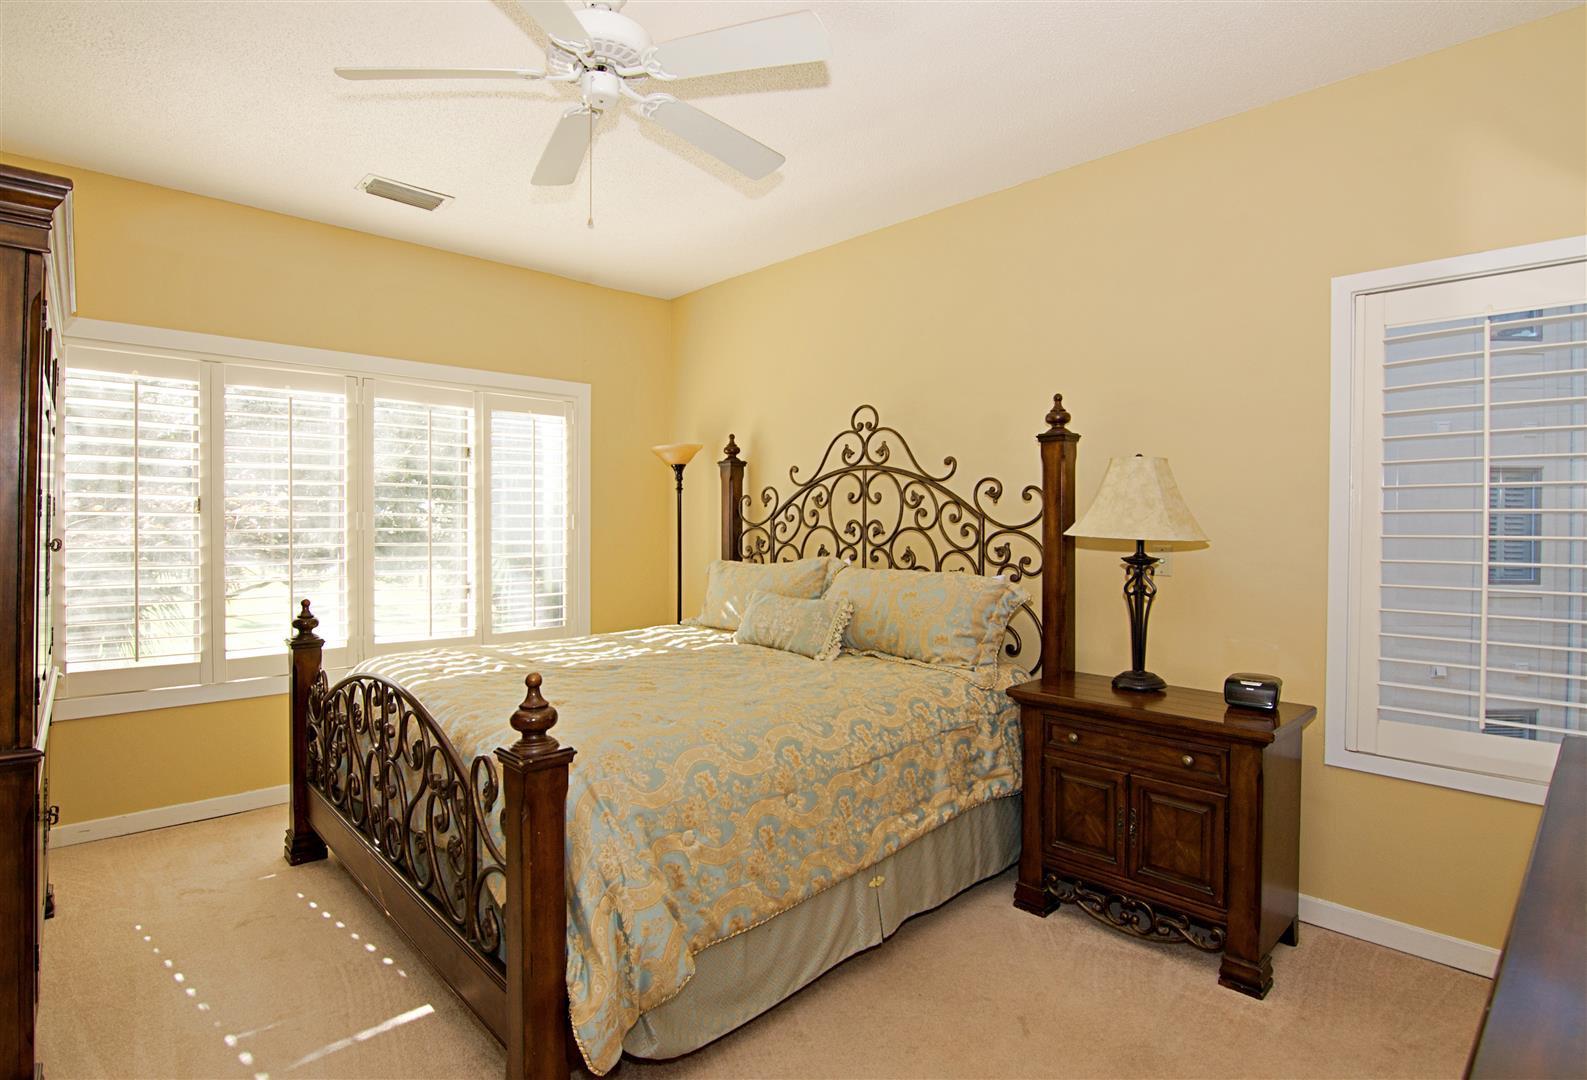 Seabrook Island Homes For Sale - 3020 Ocean Winds, Seabrook Island, SC - 31